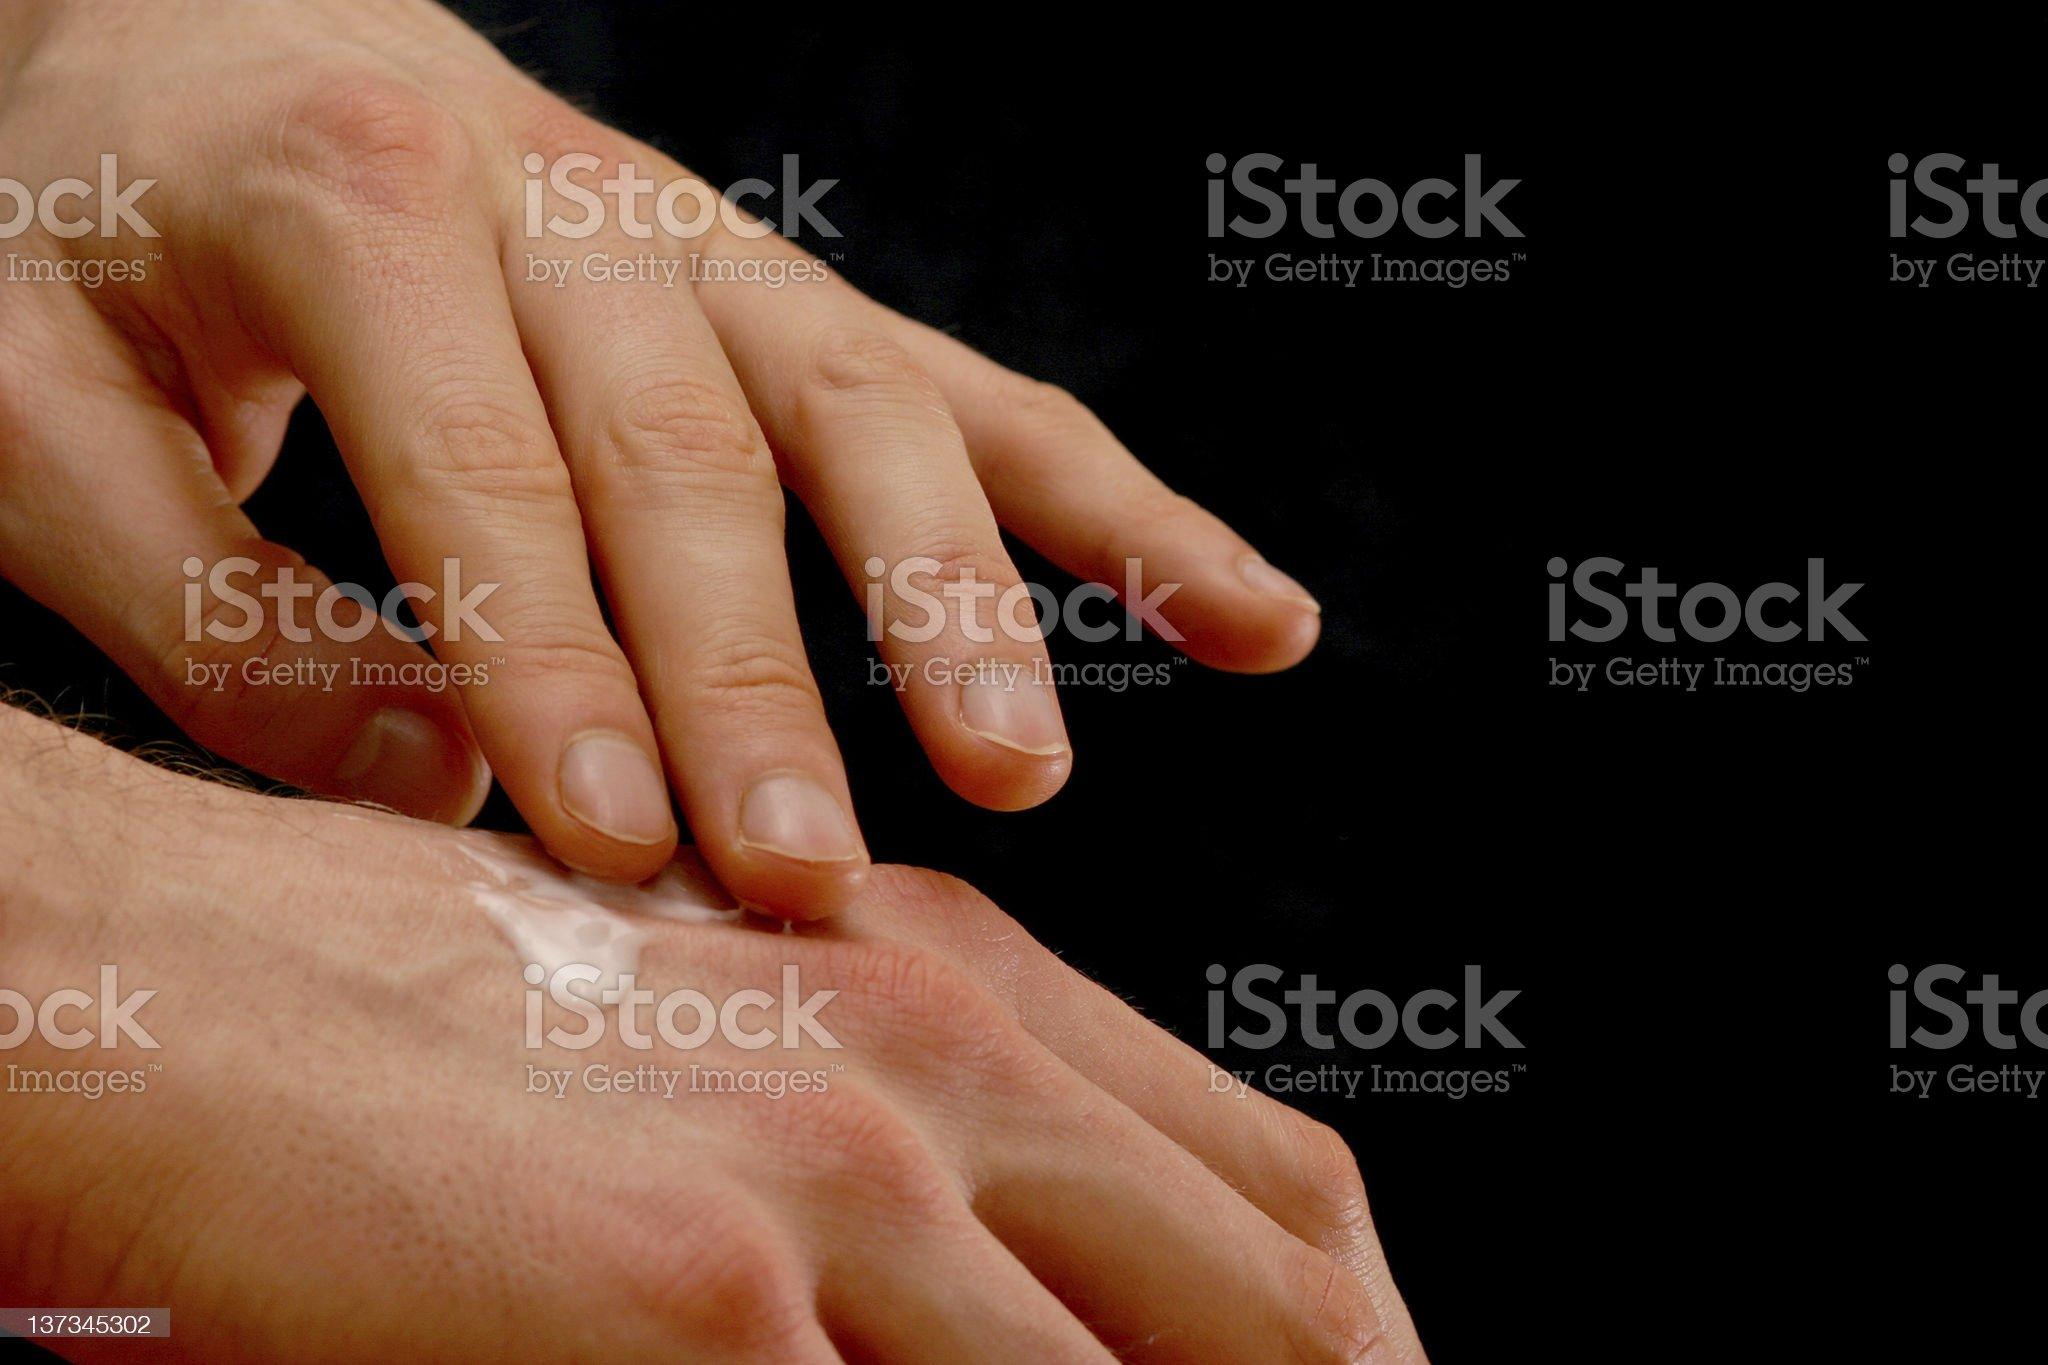 Applying lotion royalty-free stock photo